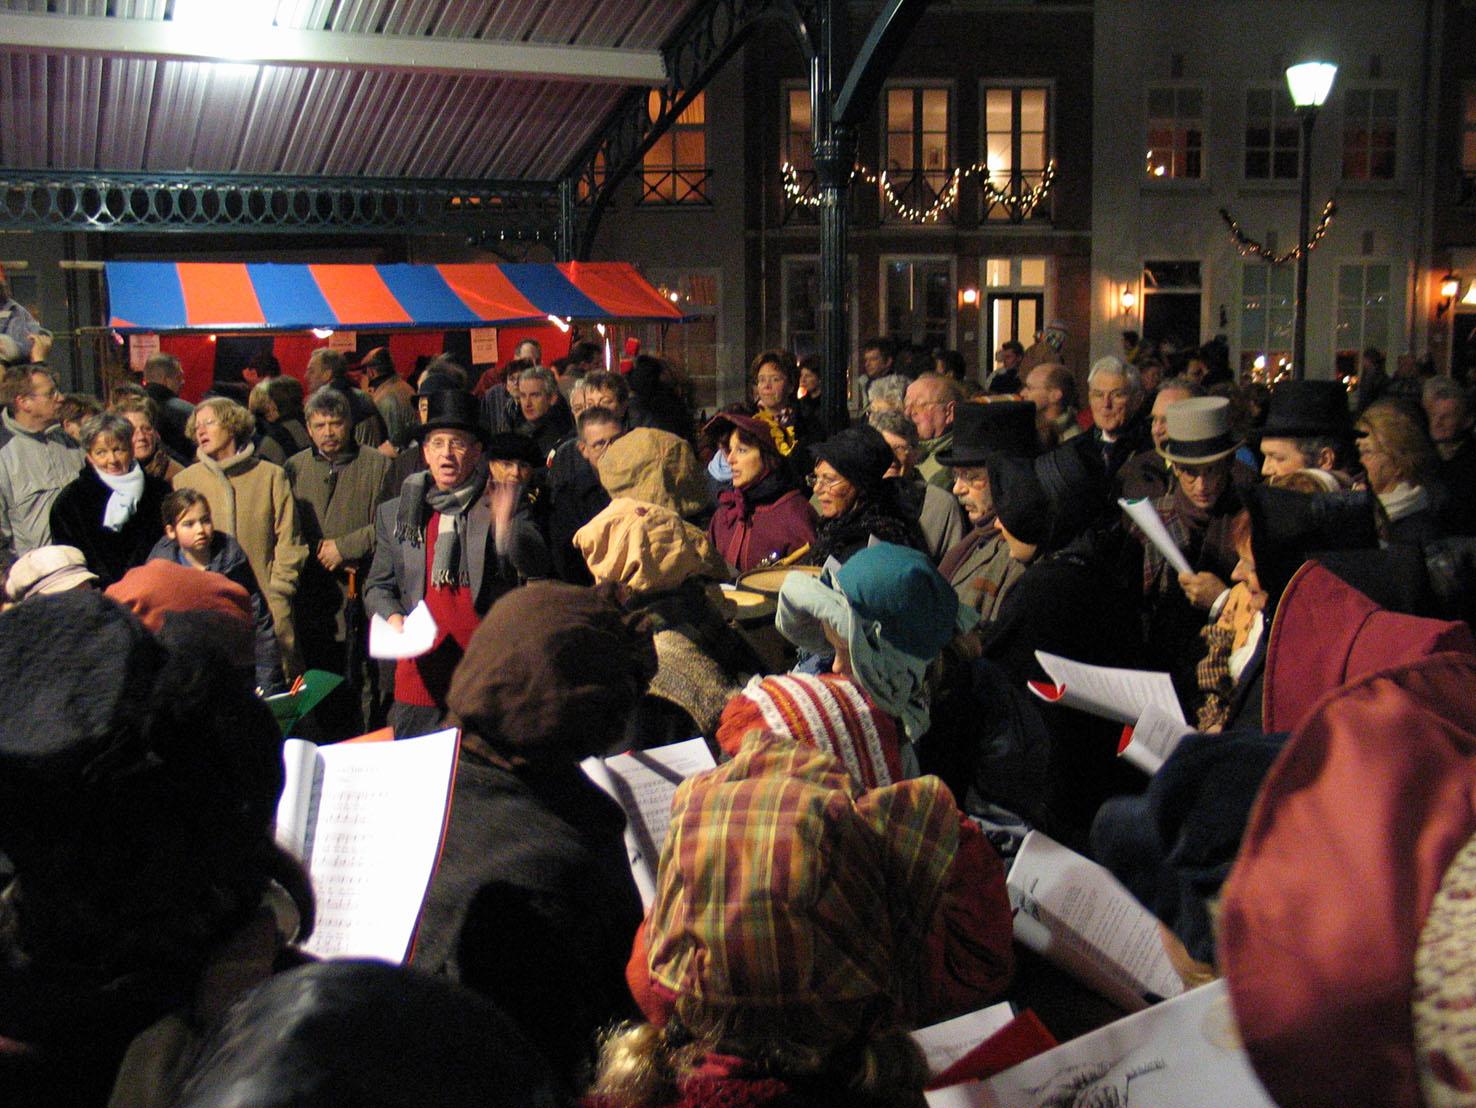 079 - Kerstmarkt Helmond 2003.jpg